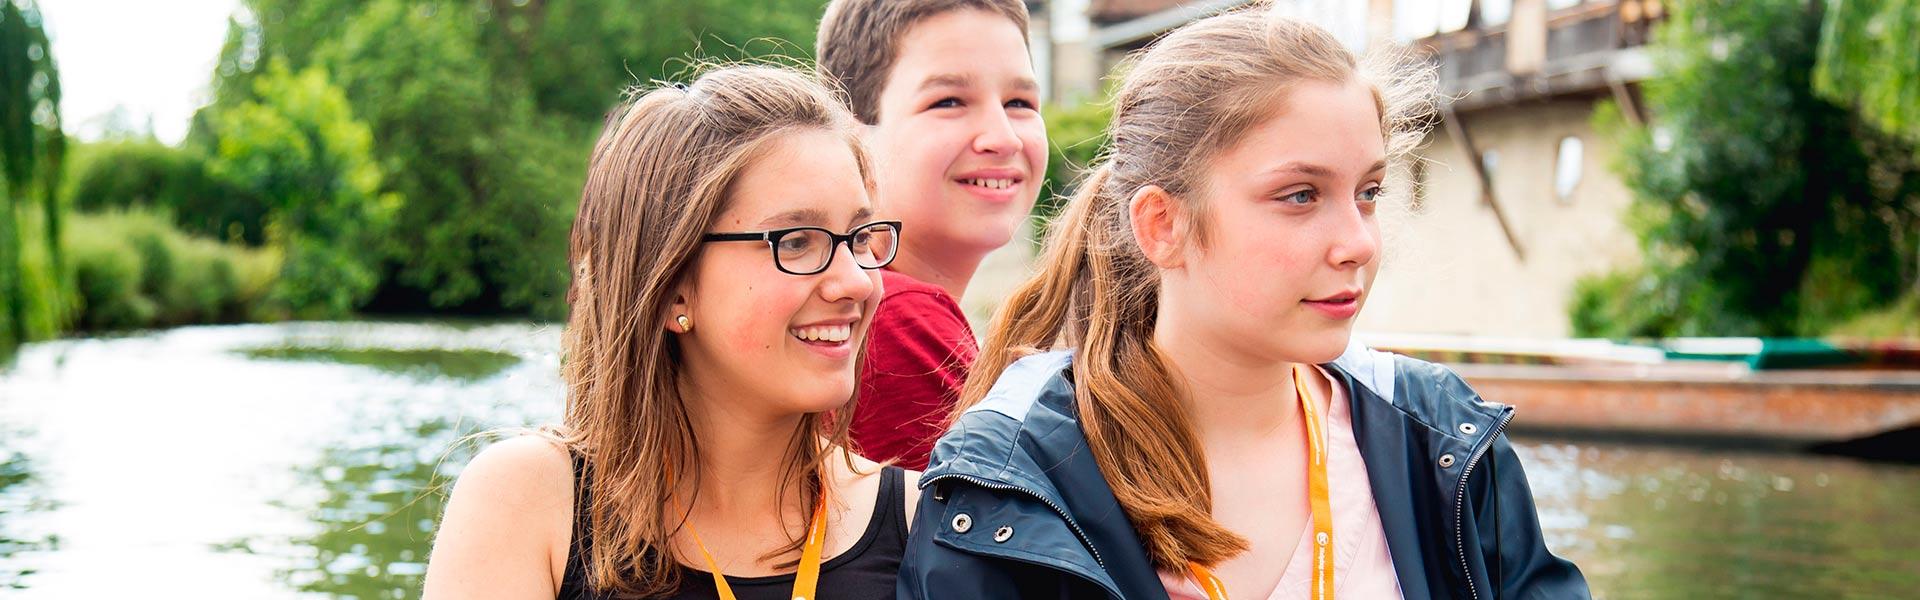 Curso de inglés para jóvenes en Bury St. Edmunds Inglaterra